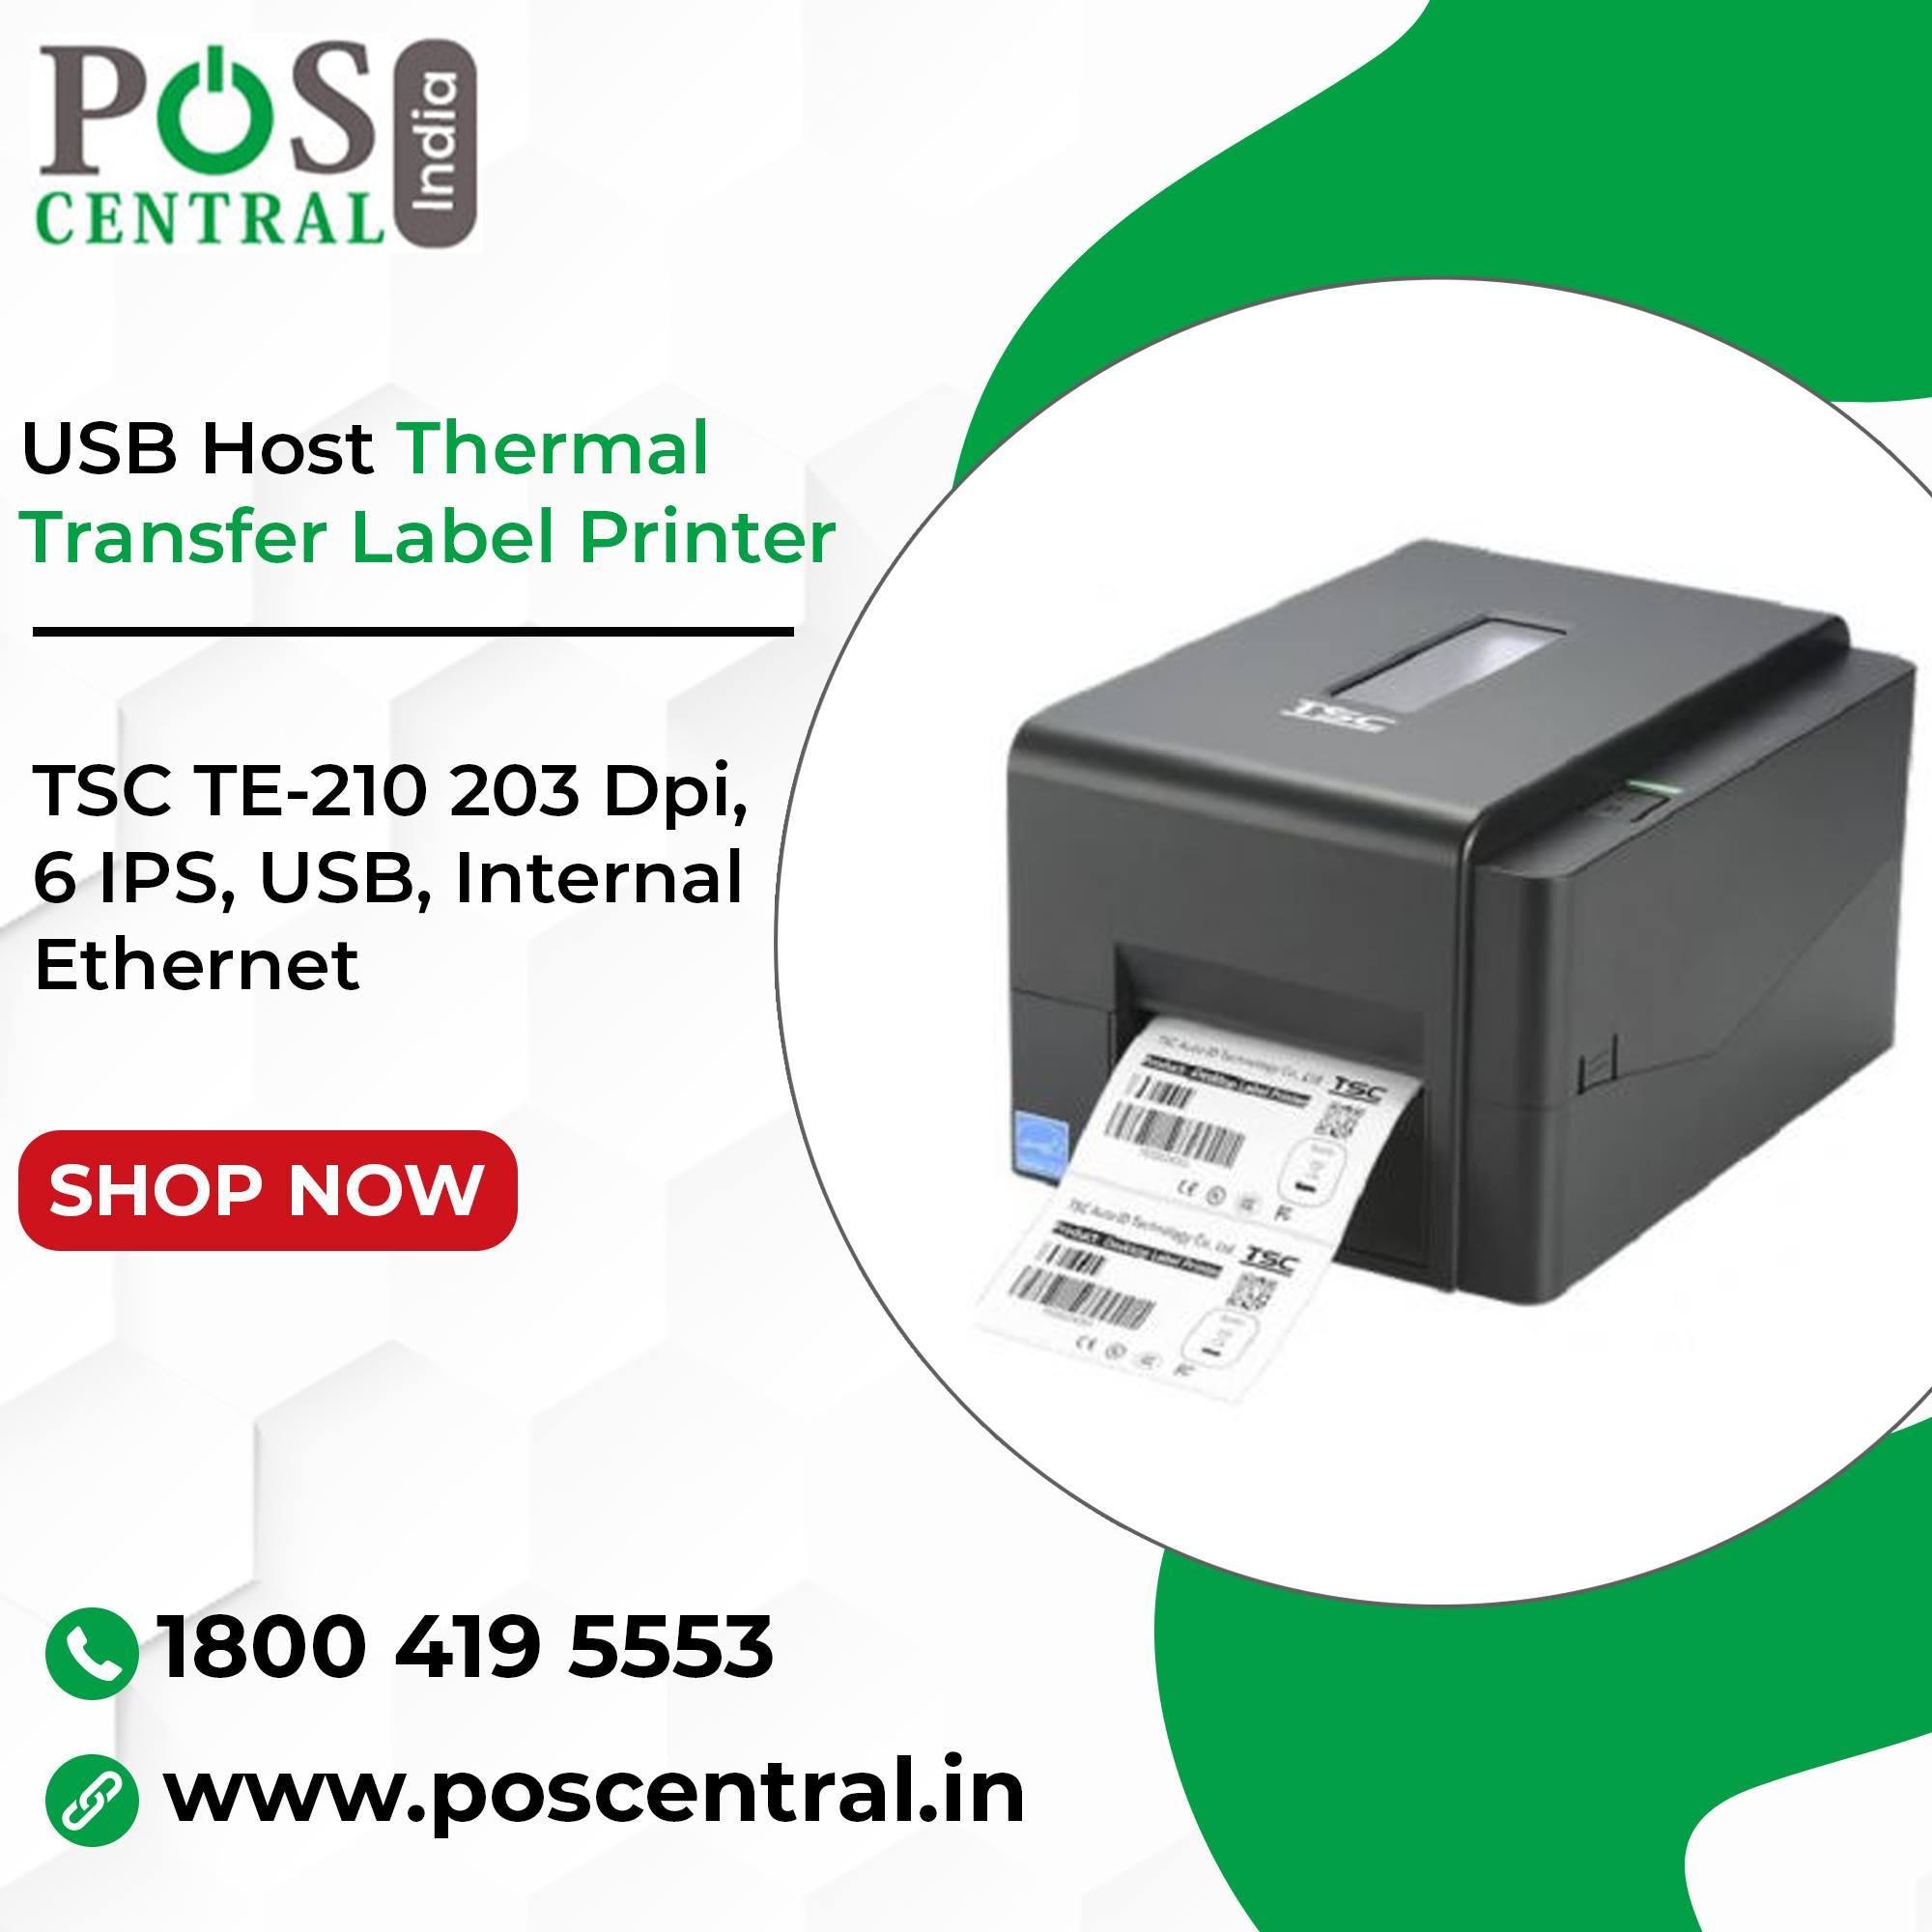 Buy Affordable TSC TE210 203 Dpi Barcode Printer in India